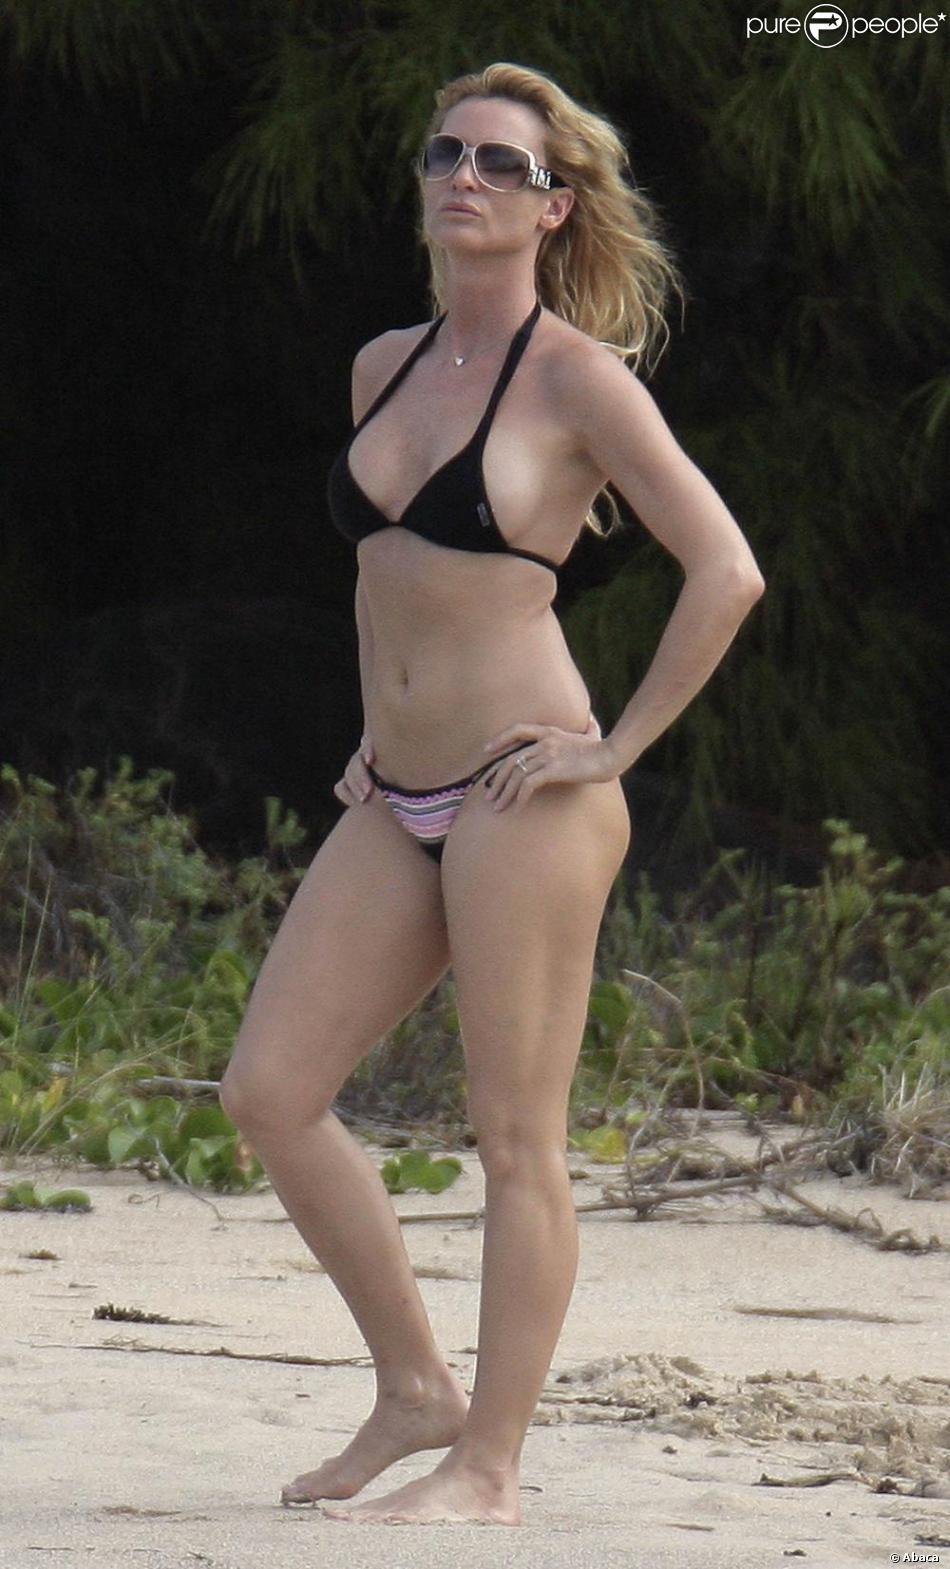 Nicole sheridan.com